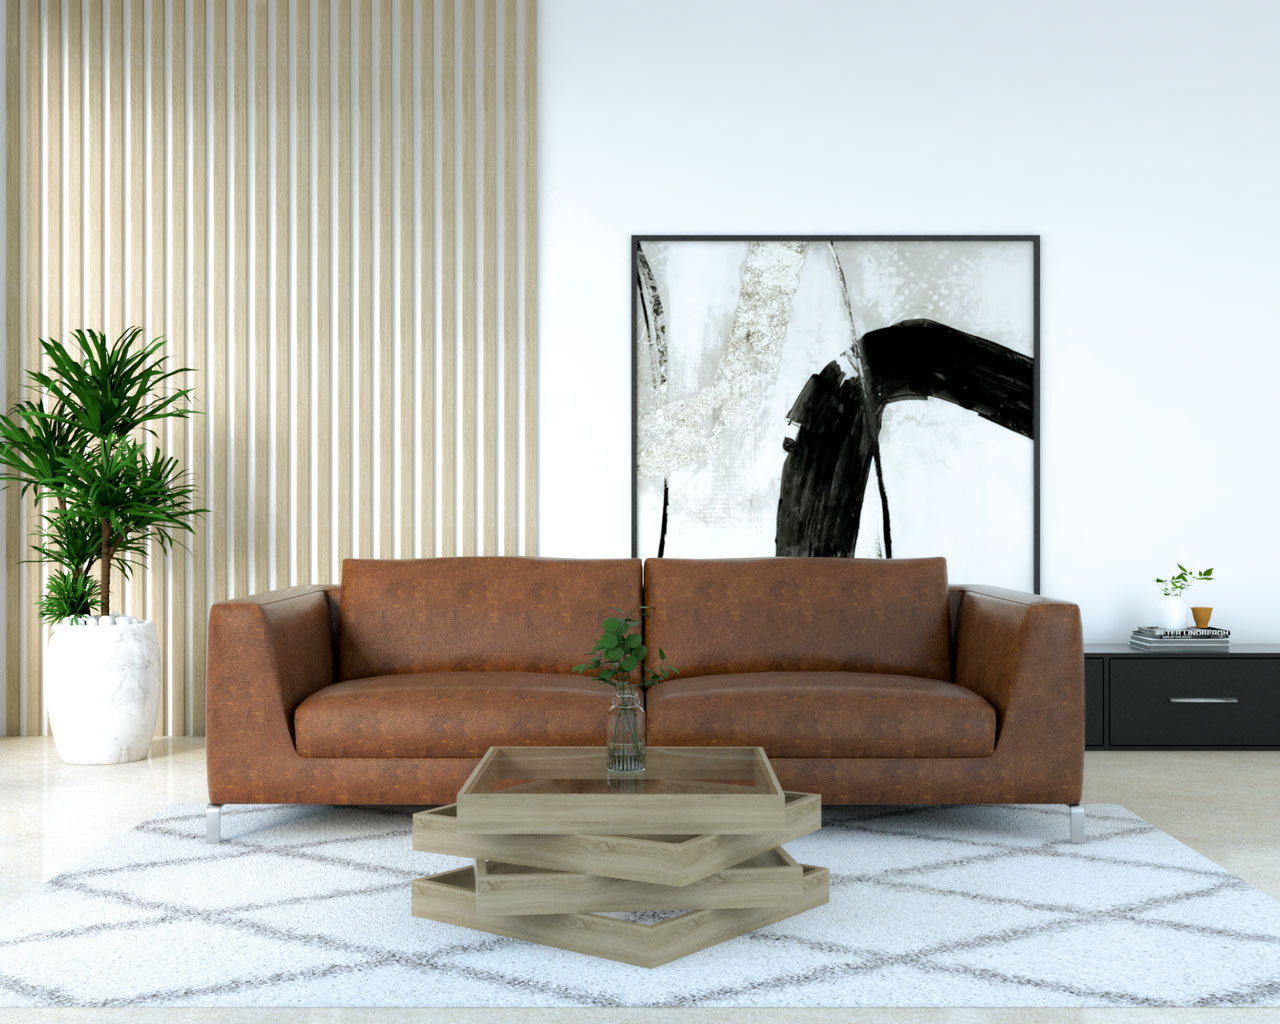 Geometric wood coffee table with brown leather sofa